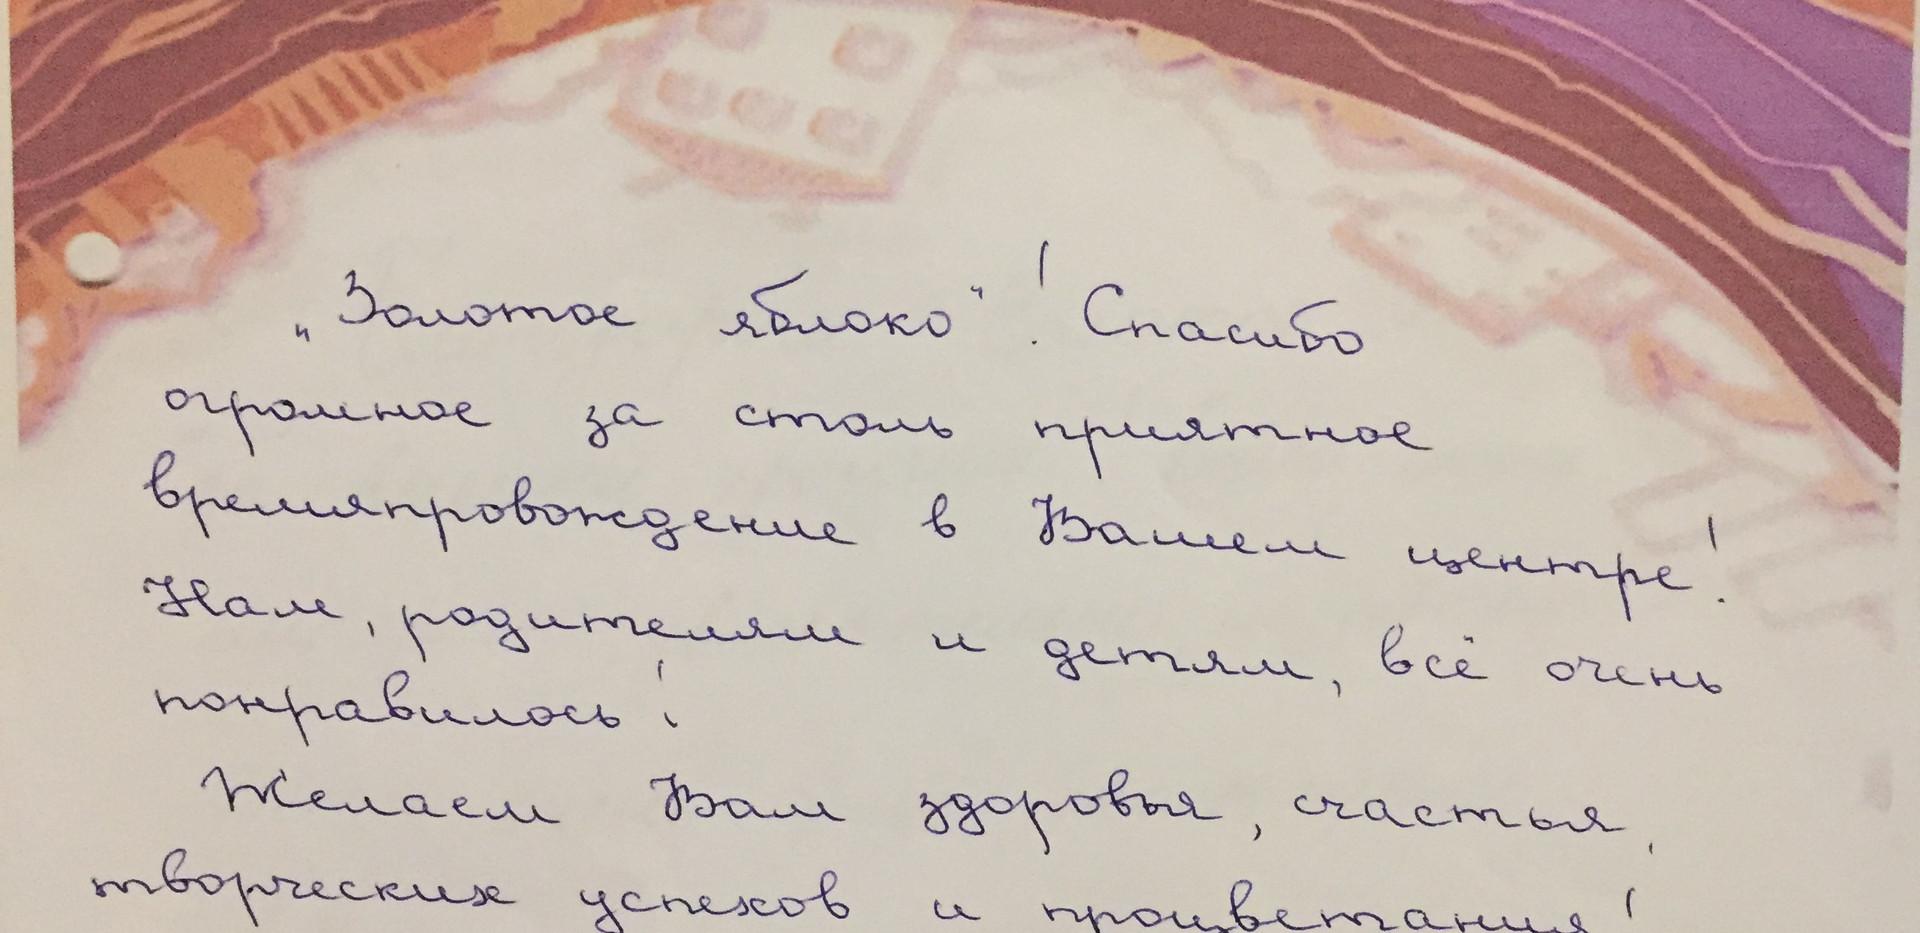 НГ КВЕСТ космос + дискотека  2 класс .JP